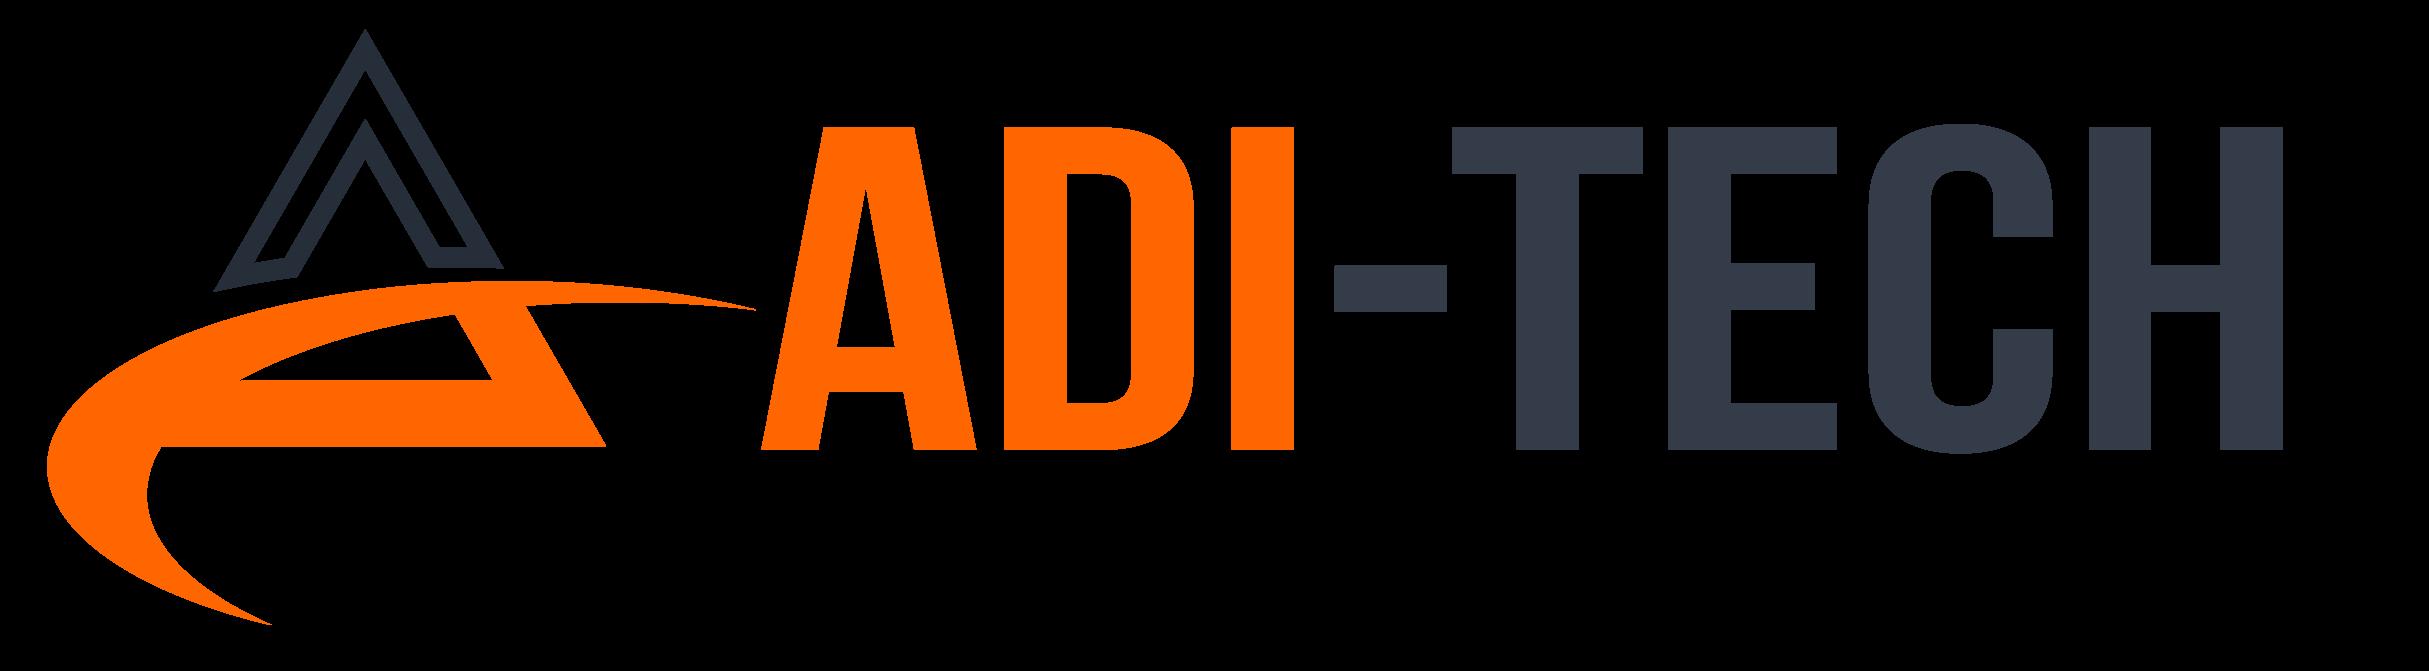 ADI-TECH Adrian Bik